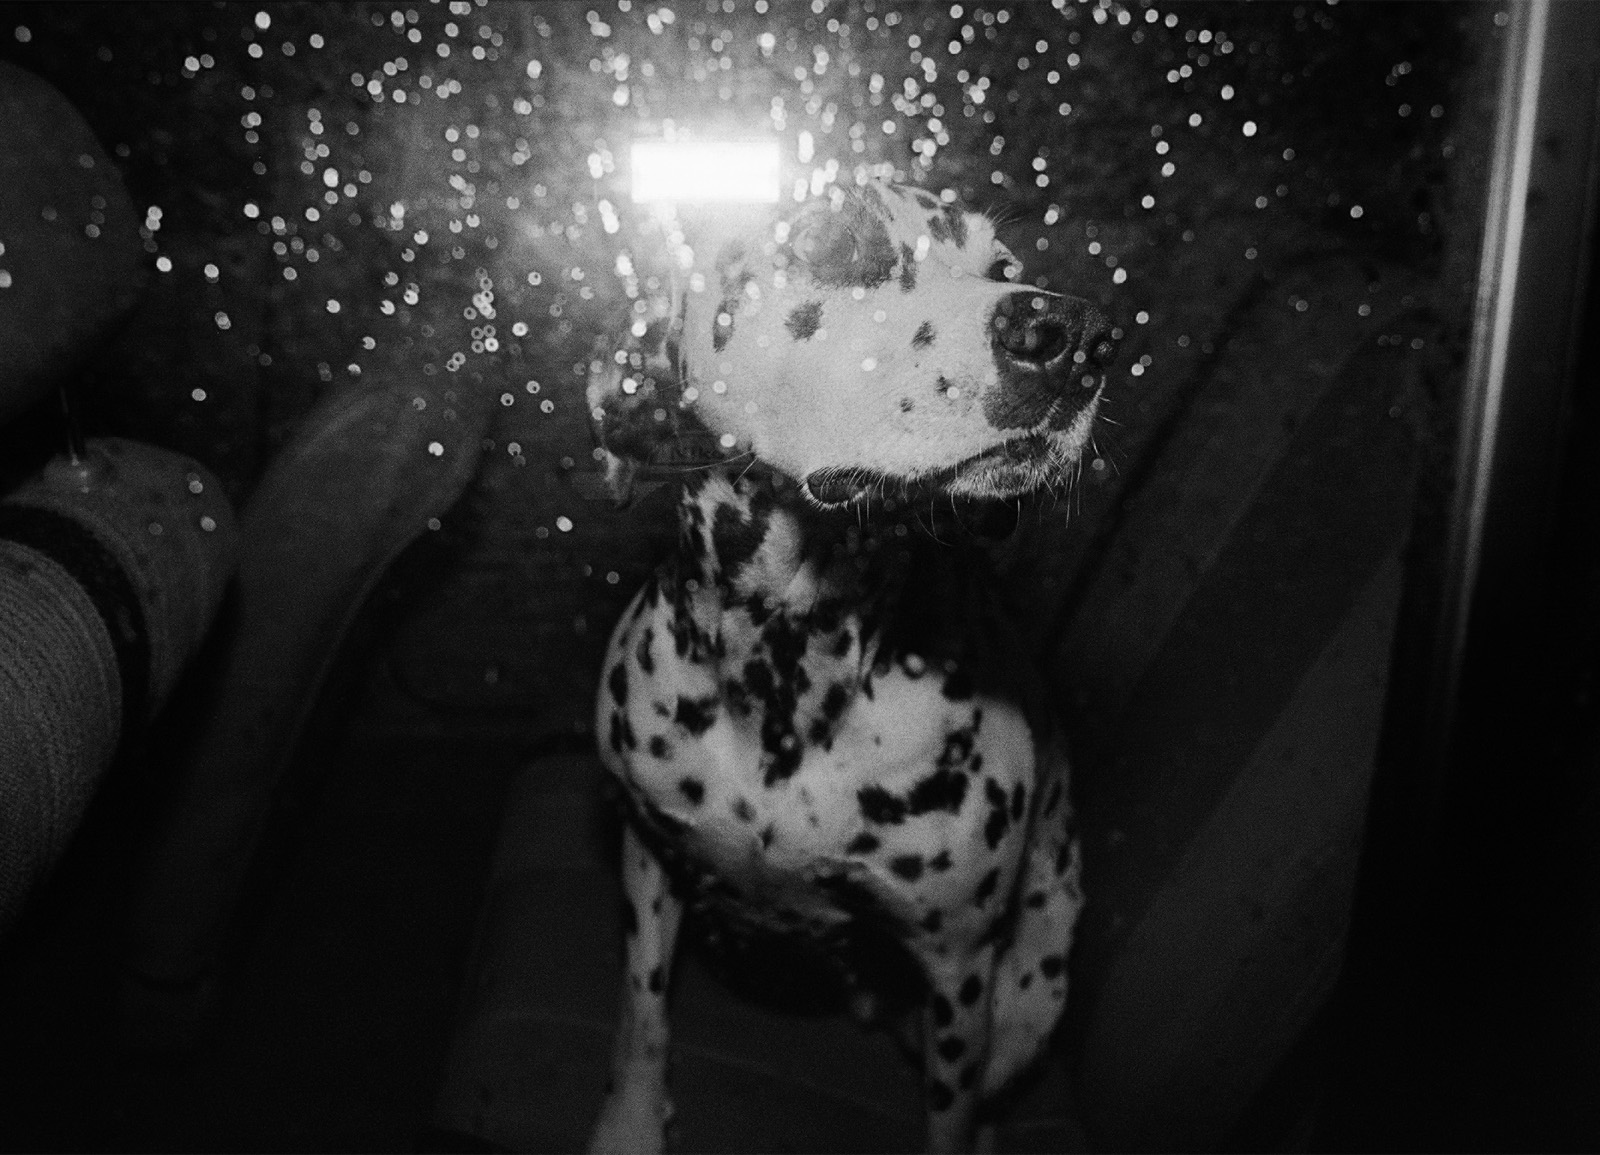 PAMĚTI NOCI – PRAHA 1983 / NIGHT MEMORIES – PRAGUE 1983 © PETER ŽUPNÍK: Psí noc / Dog's Night